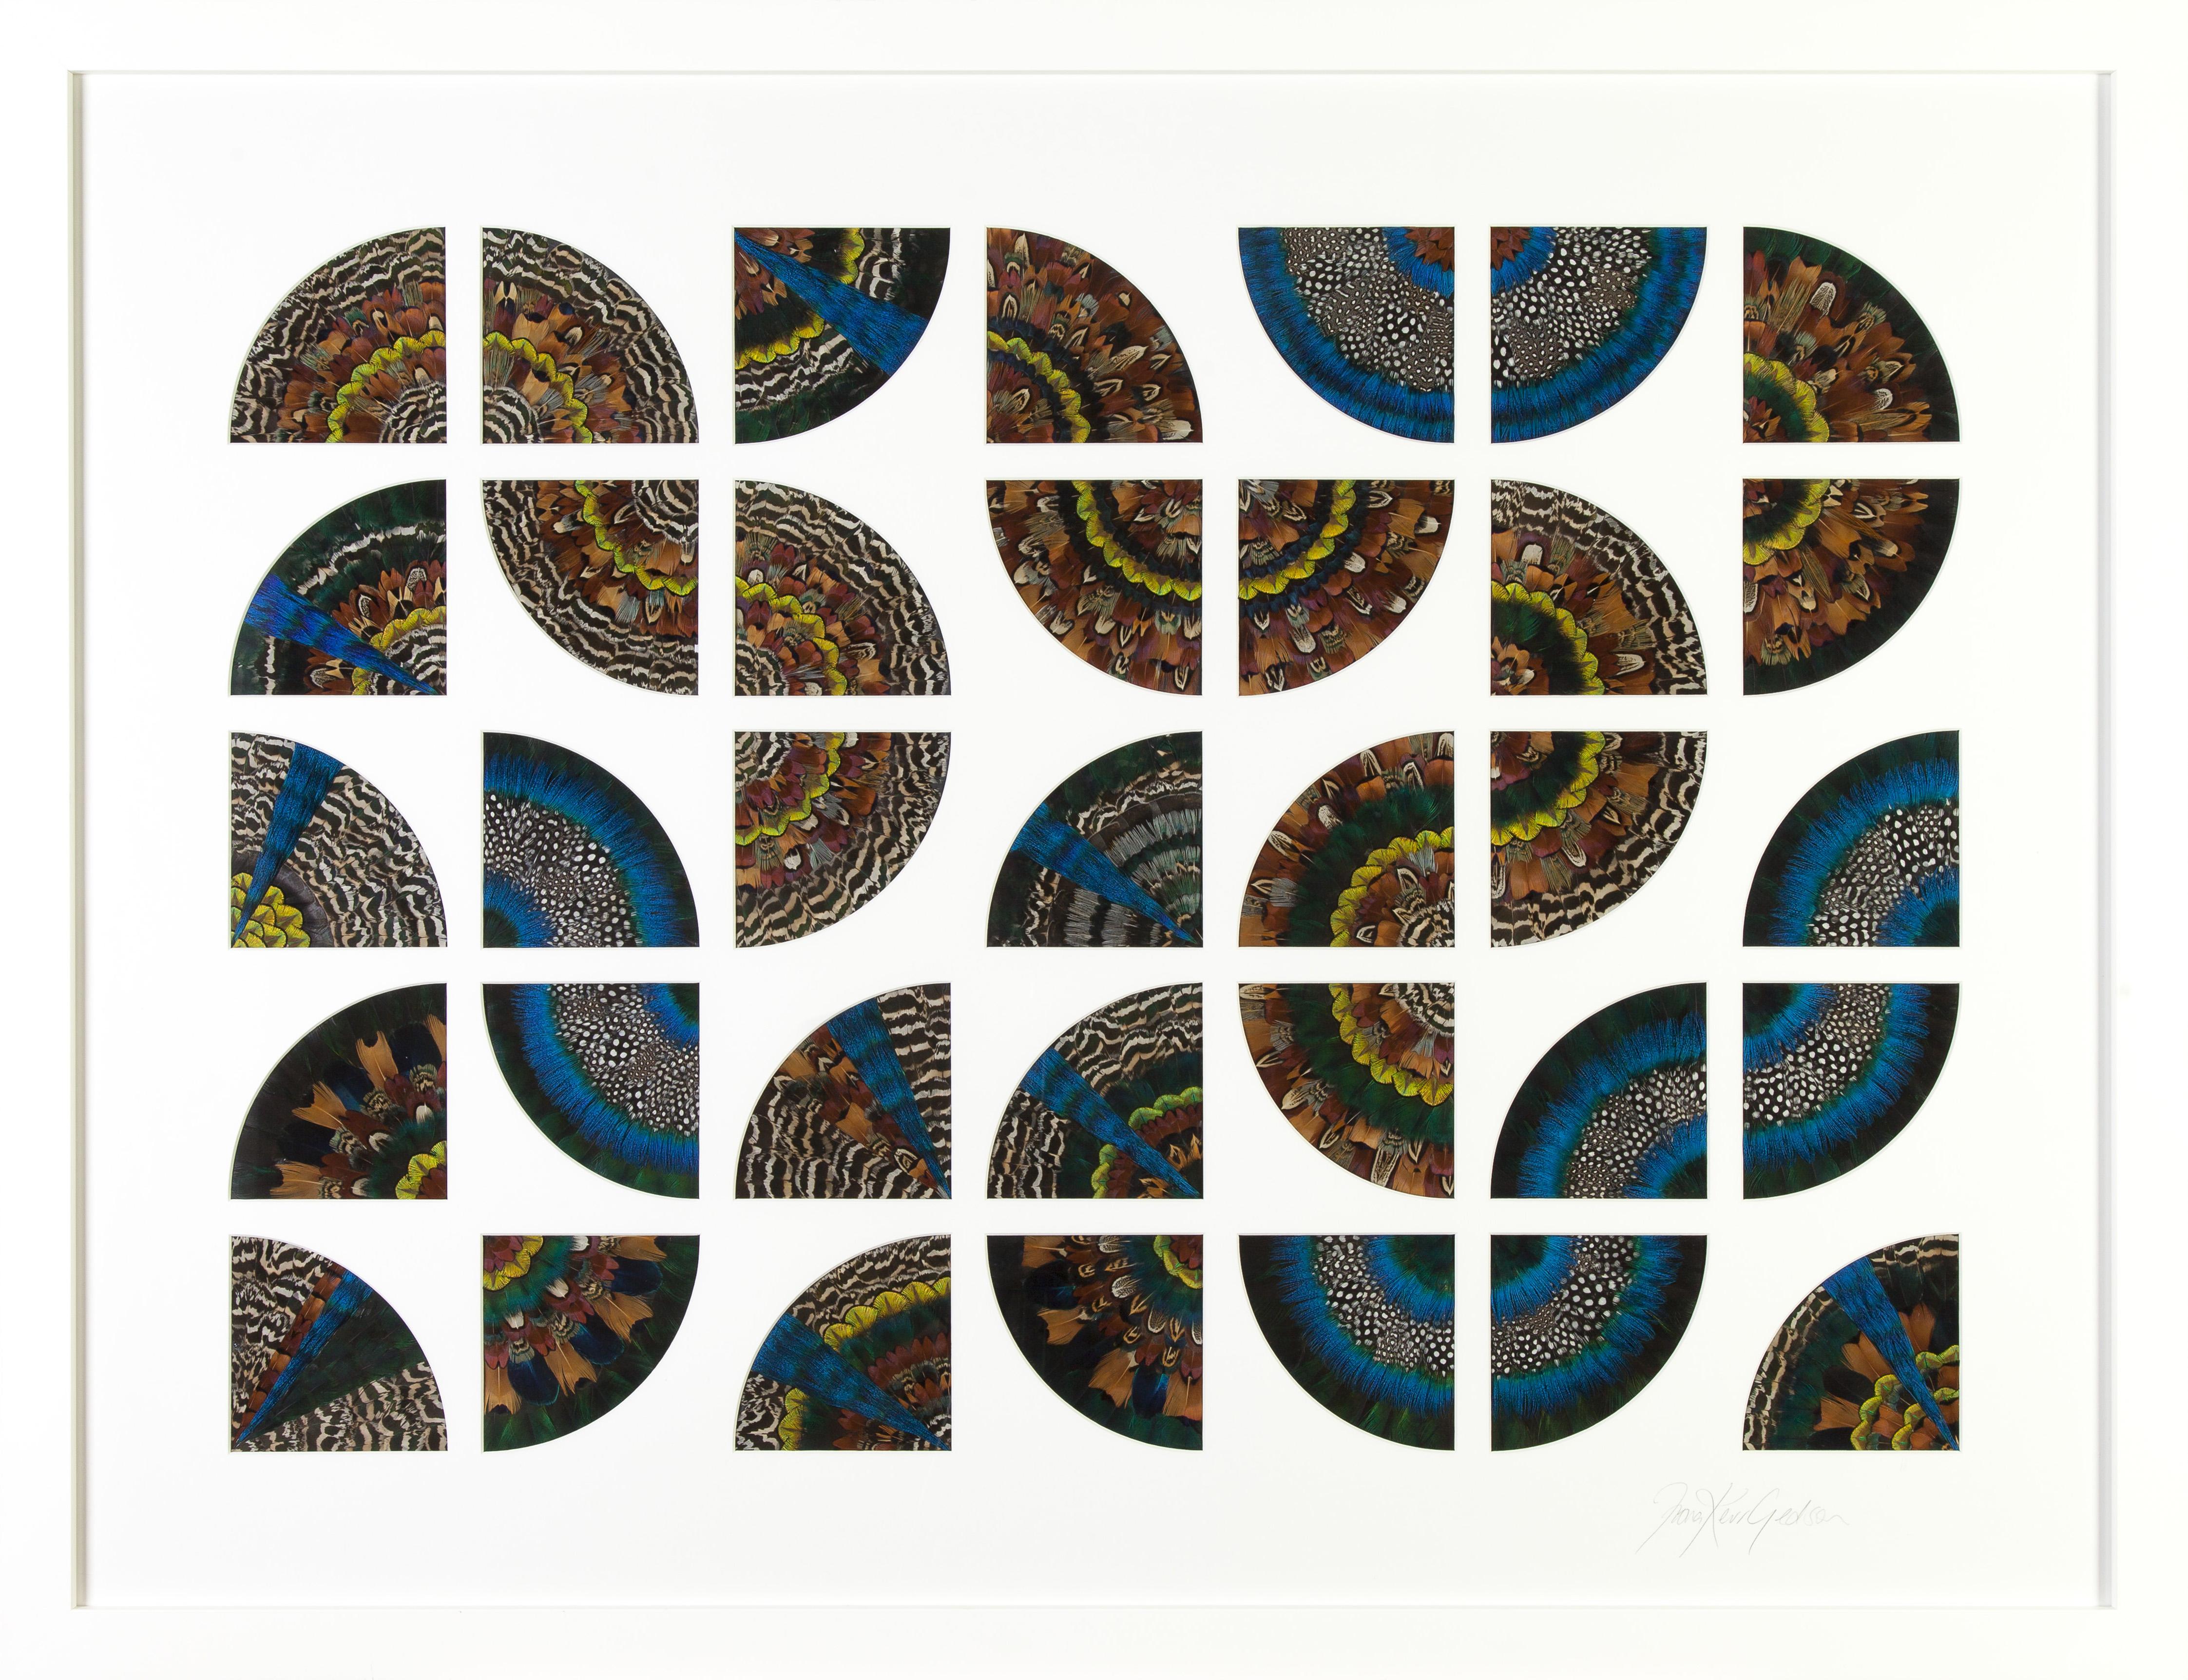 Fiona Kerr Gedson - Maths Mandala 35x.25=8